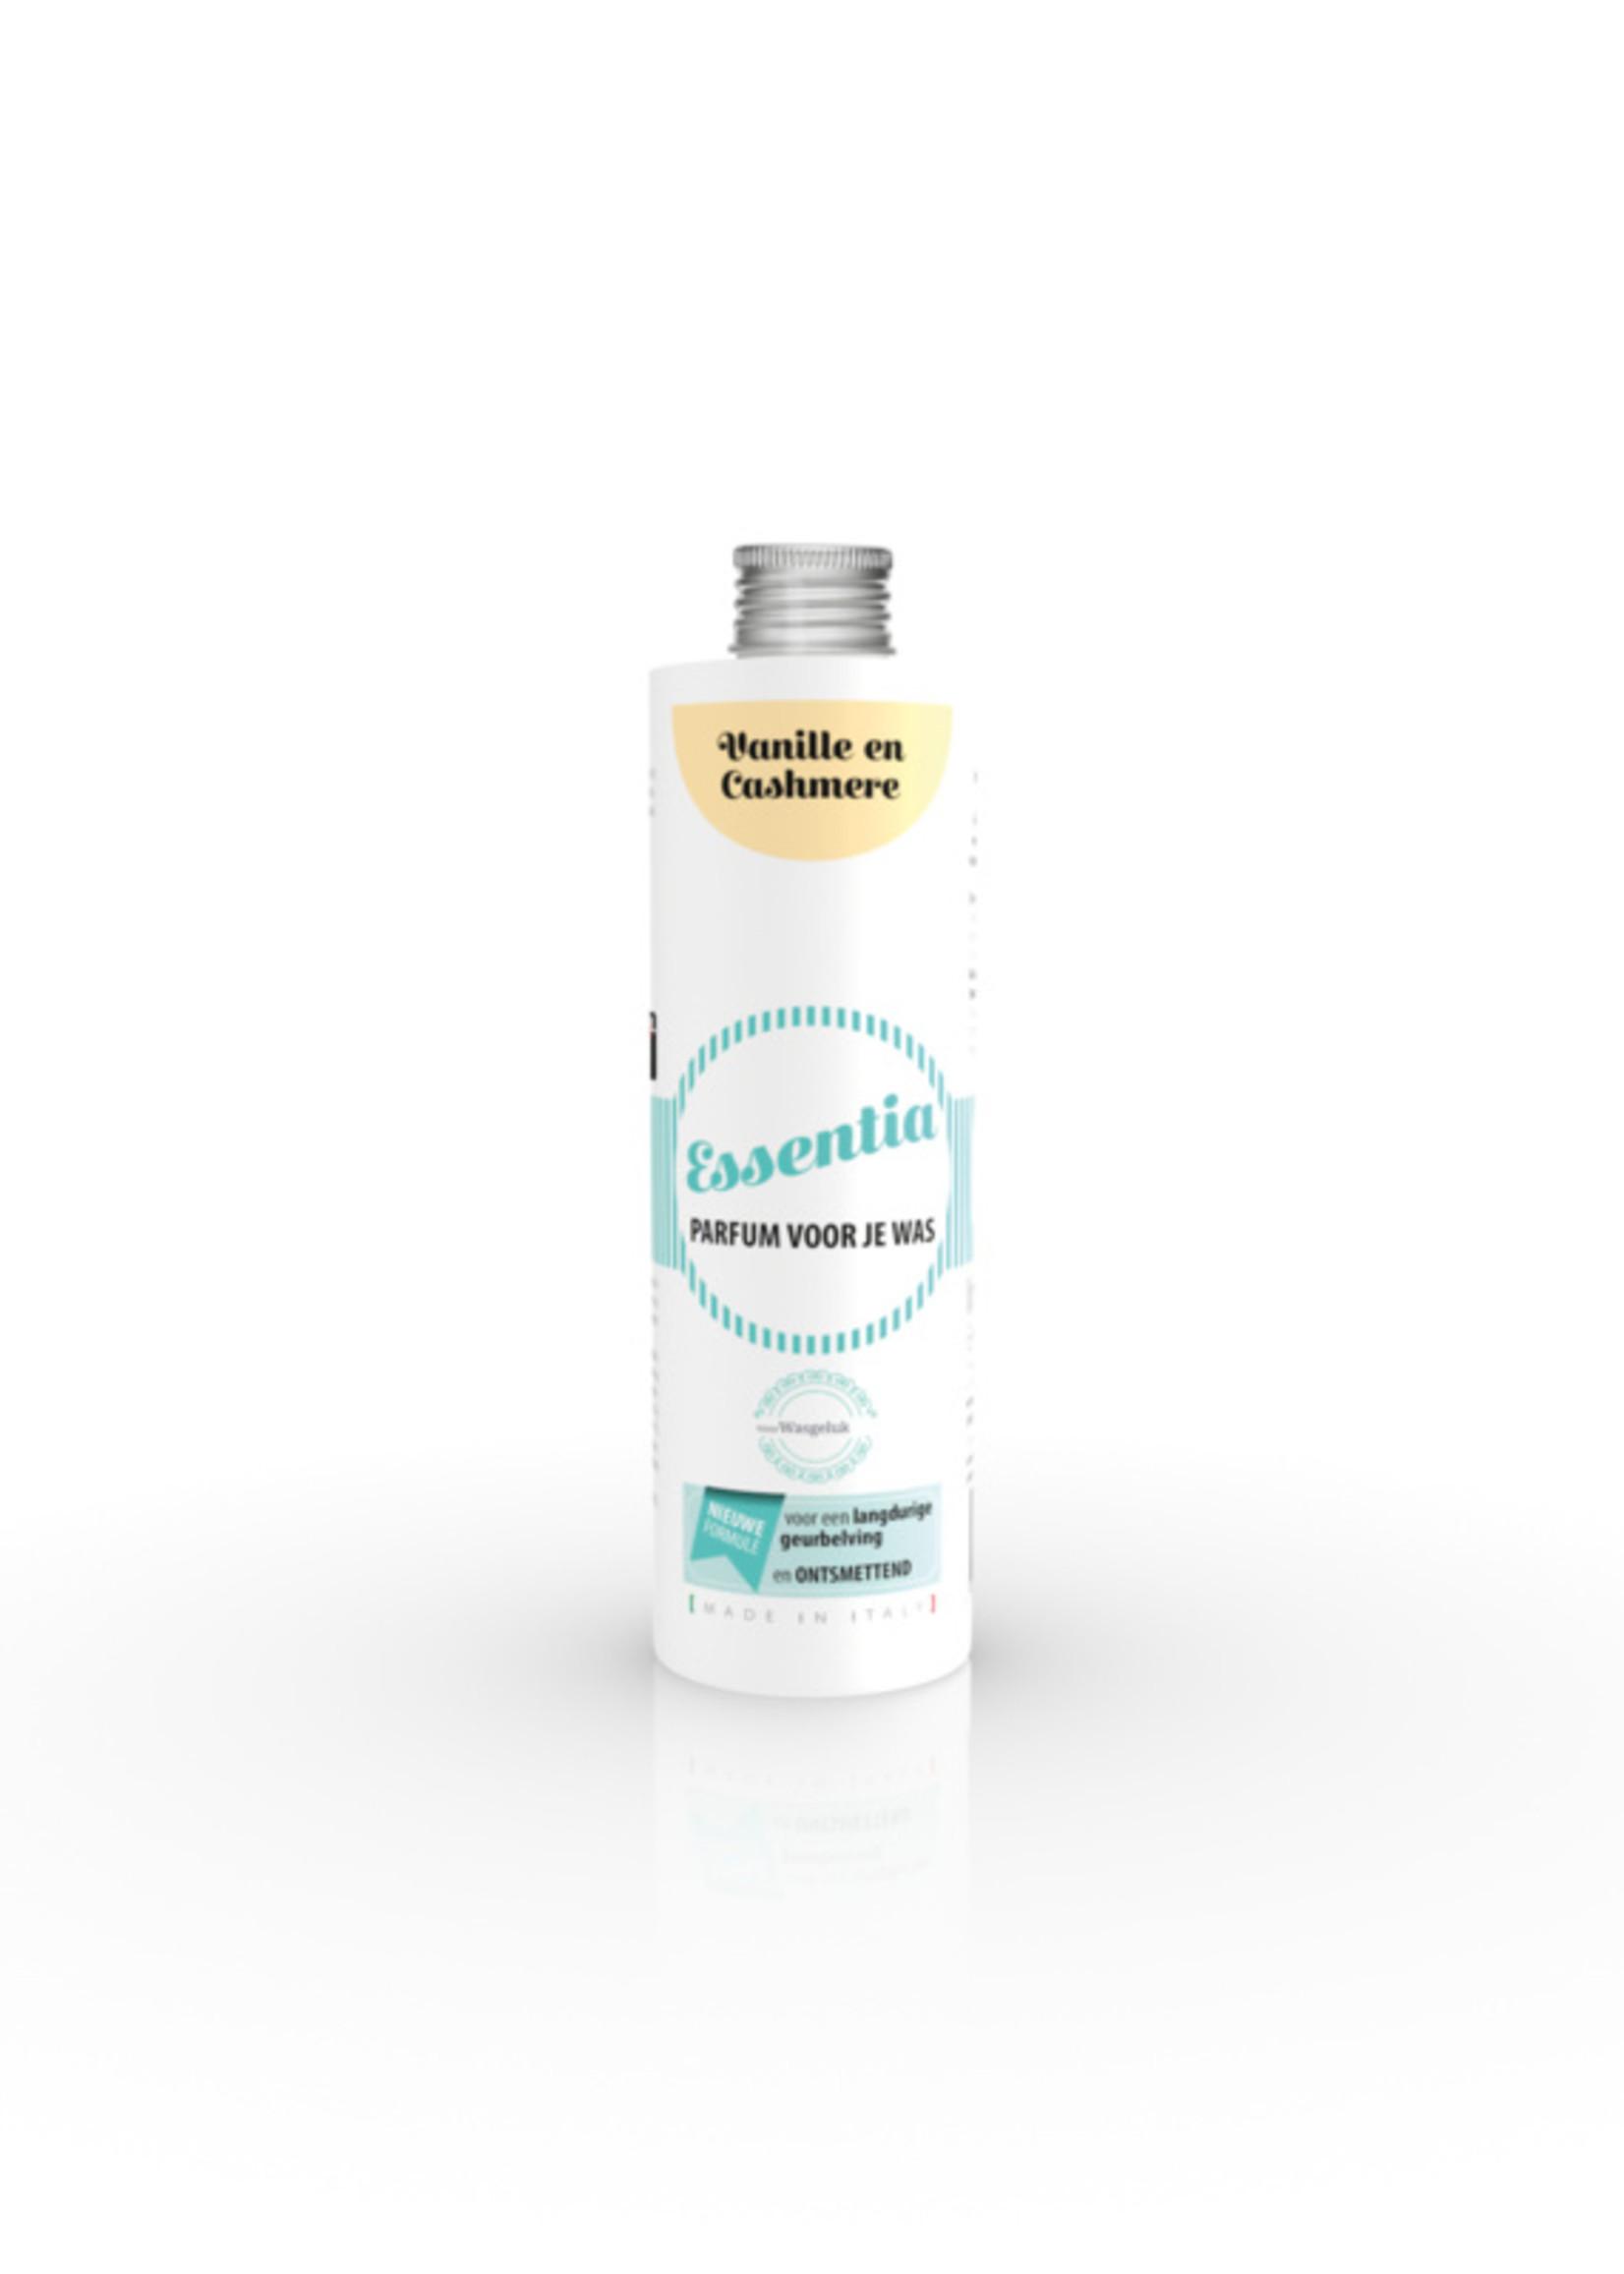 Wasgeluk Wasgeluk Vanille met Cashmere